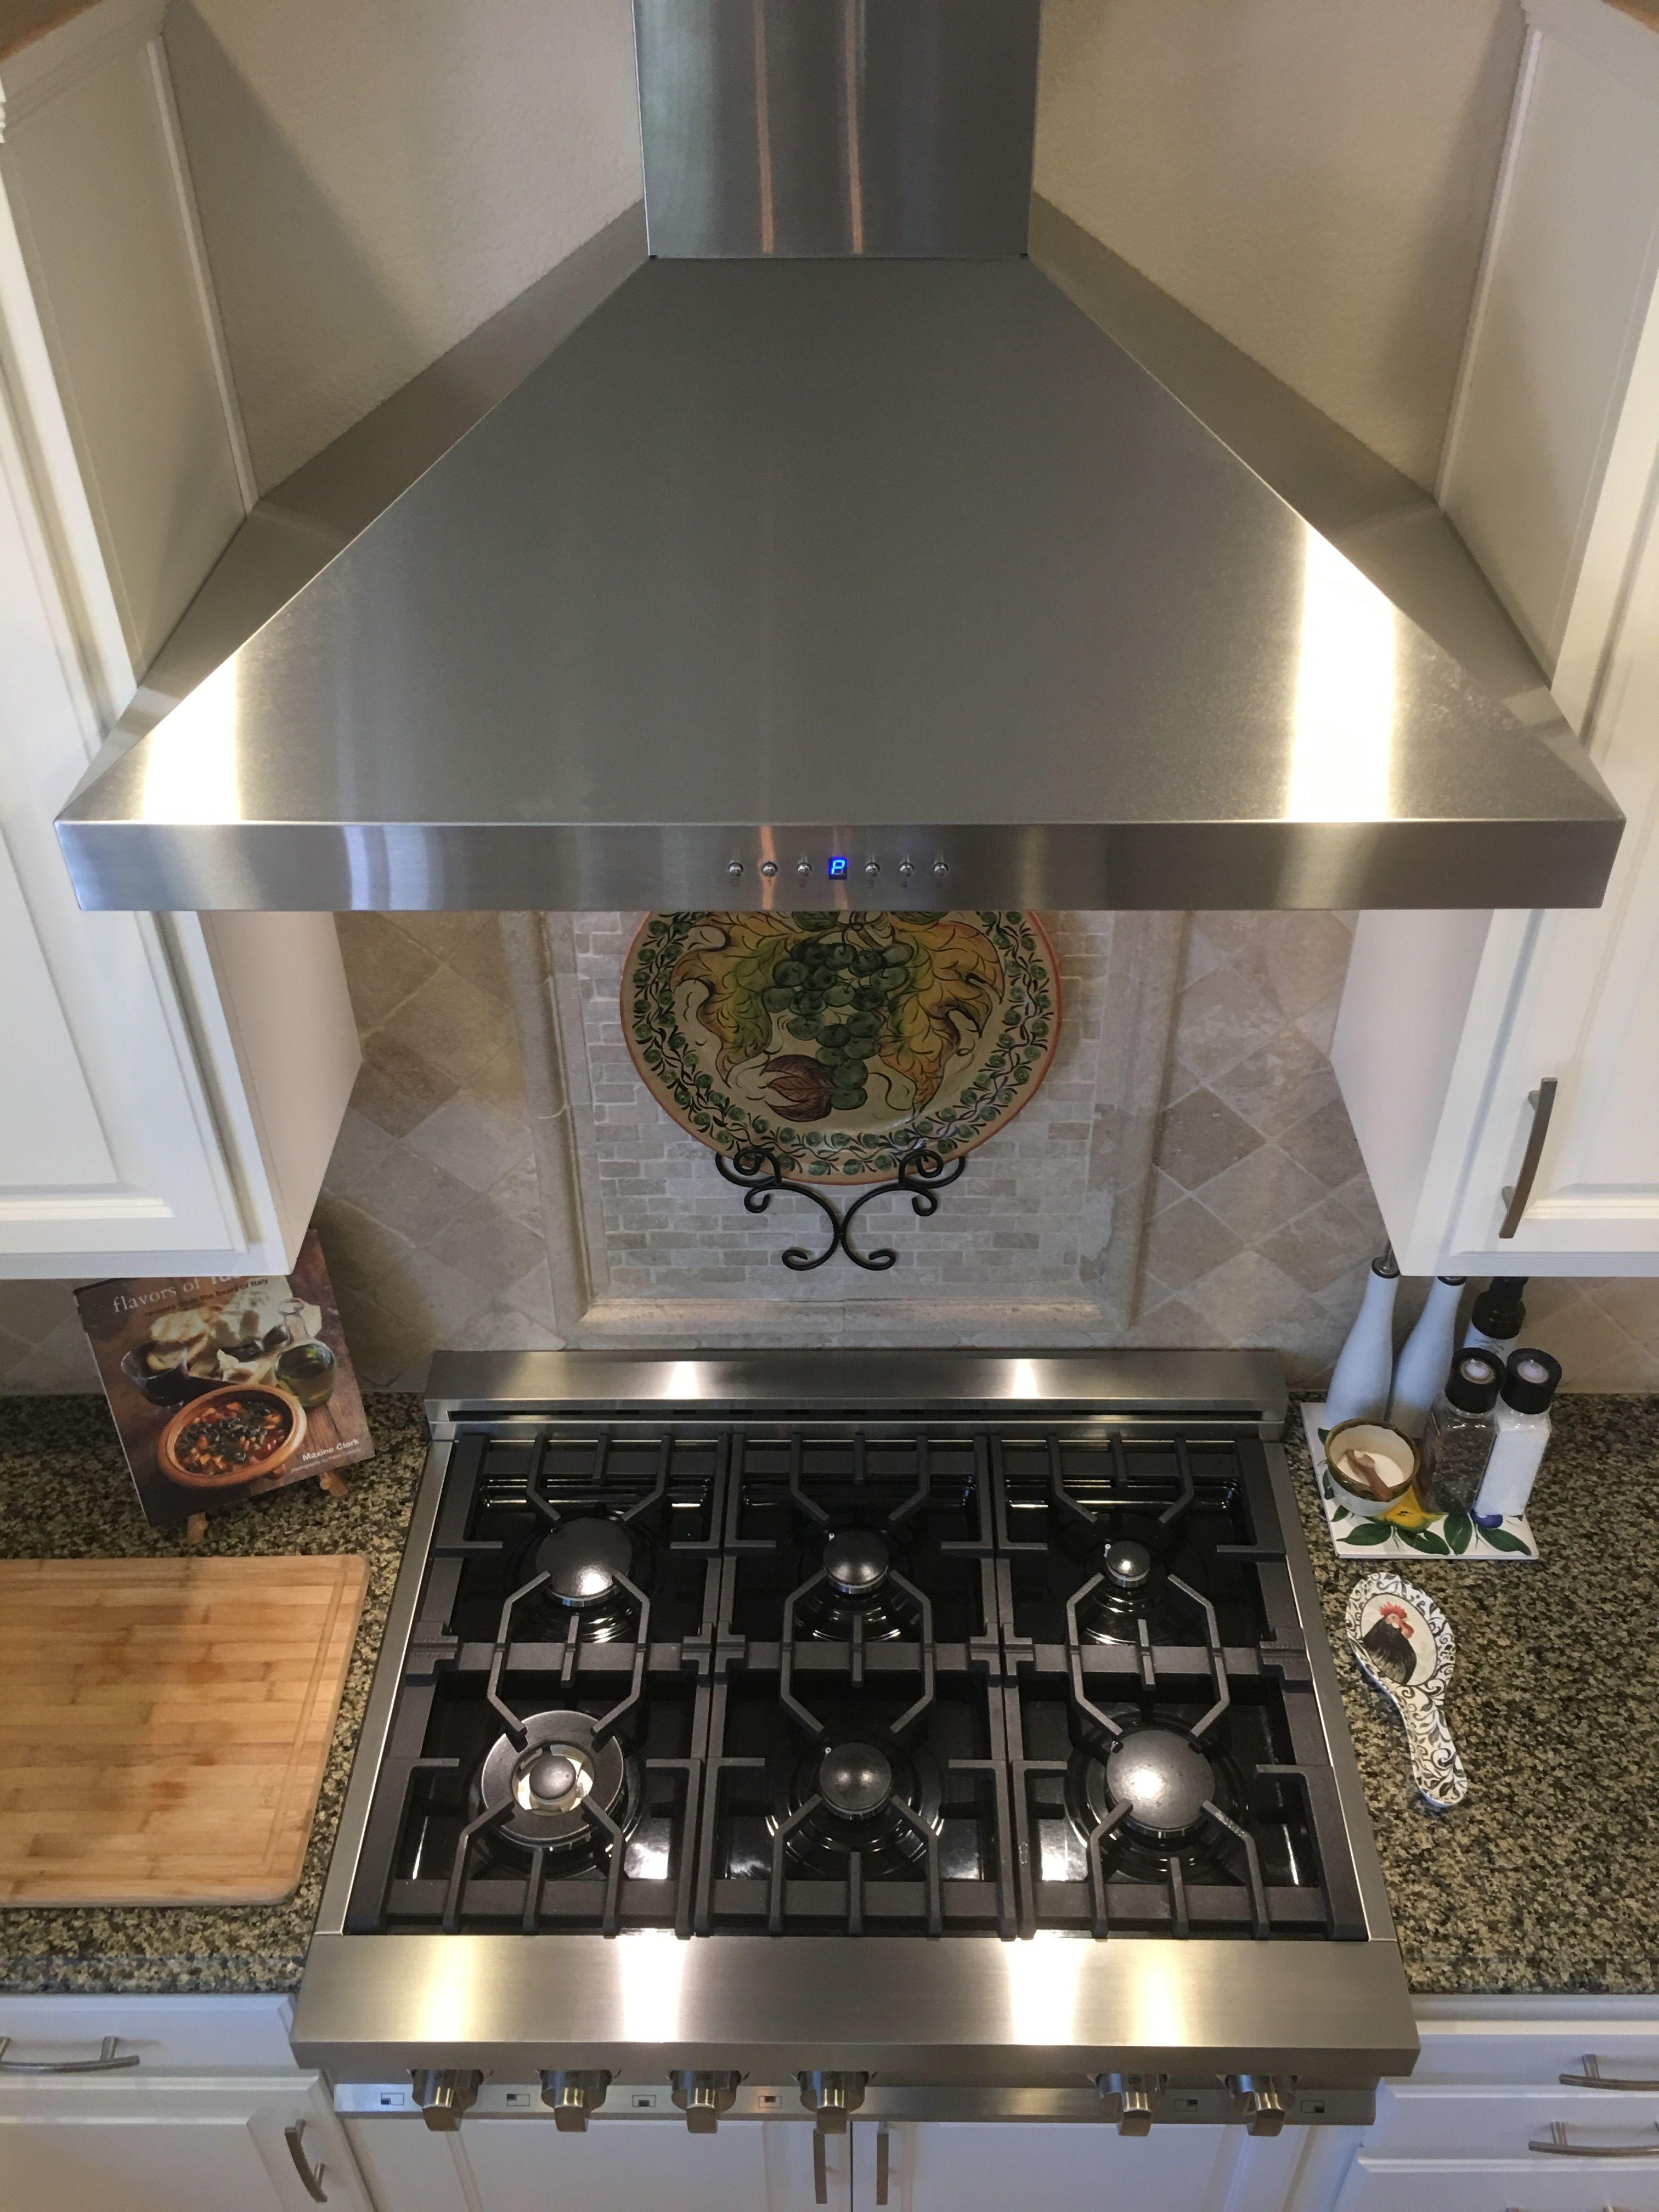 Zline 36 In Porcelain Rangetop With 6 Gas Burners Rt36 Gas Burners 6 Burner Gas Stove Home Remodeling